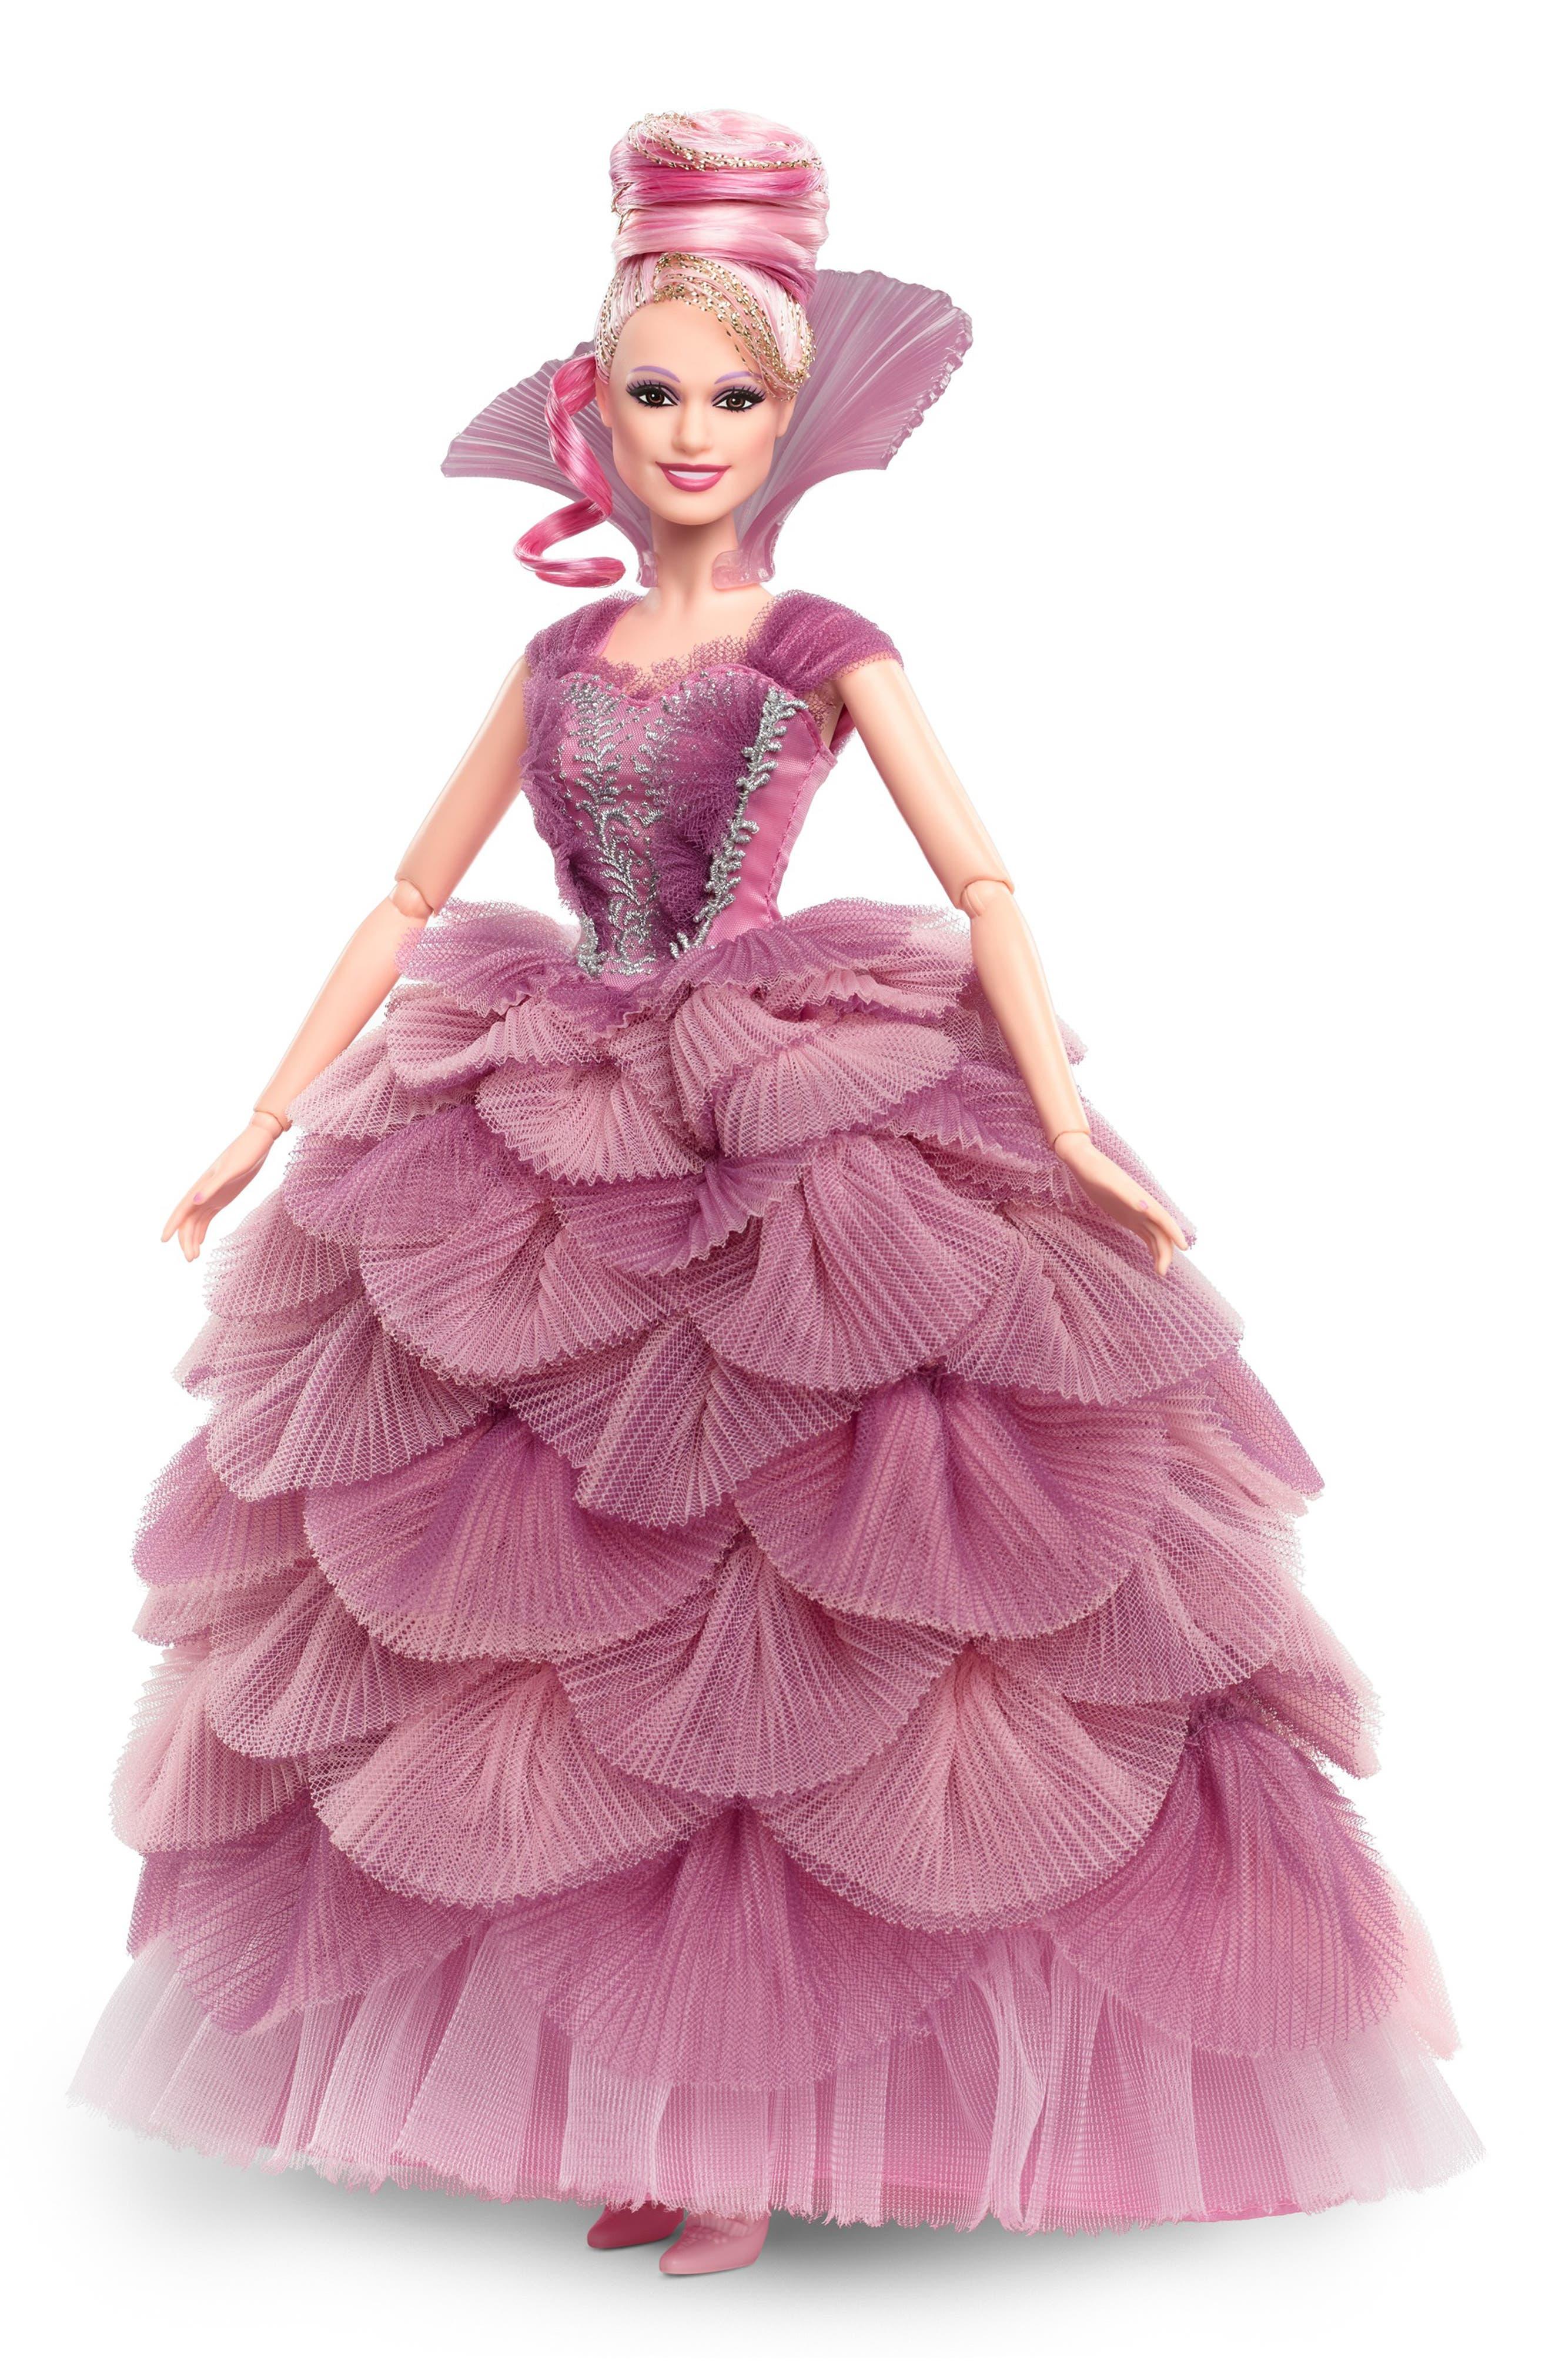 MATTEL Disney<sup>®</sup> The Nutcracker & the Four Realms Sugar Plum Fairy Barbie<sup>®</sup> Doll, Main, color, 960